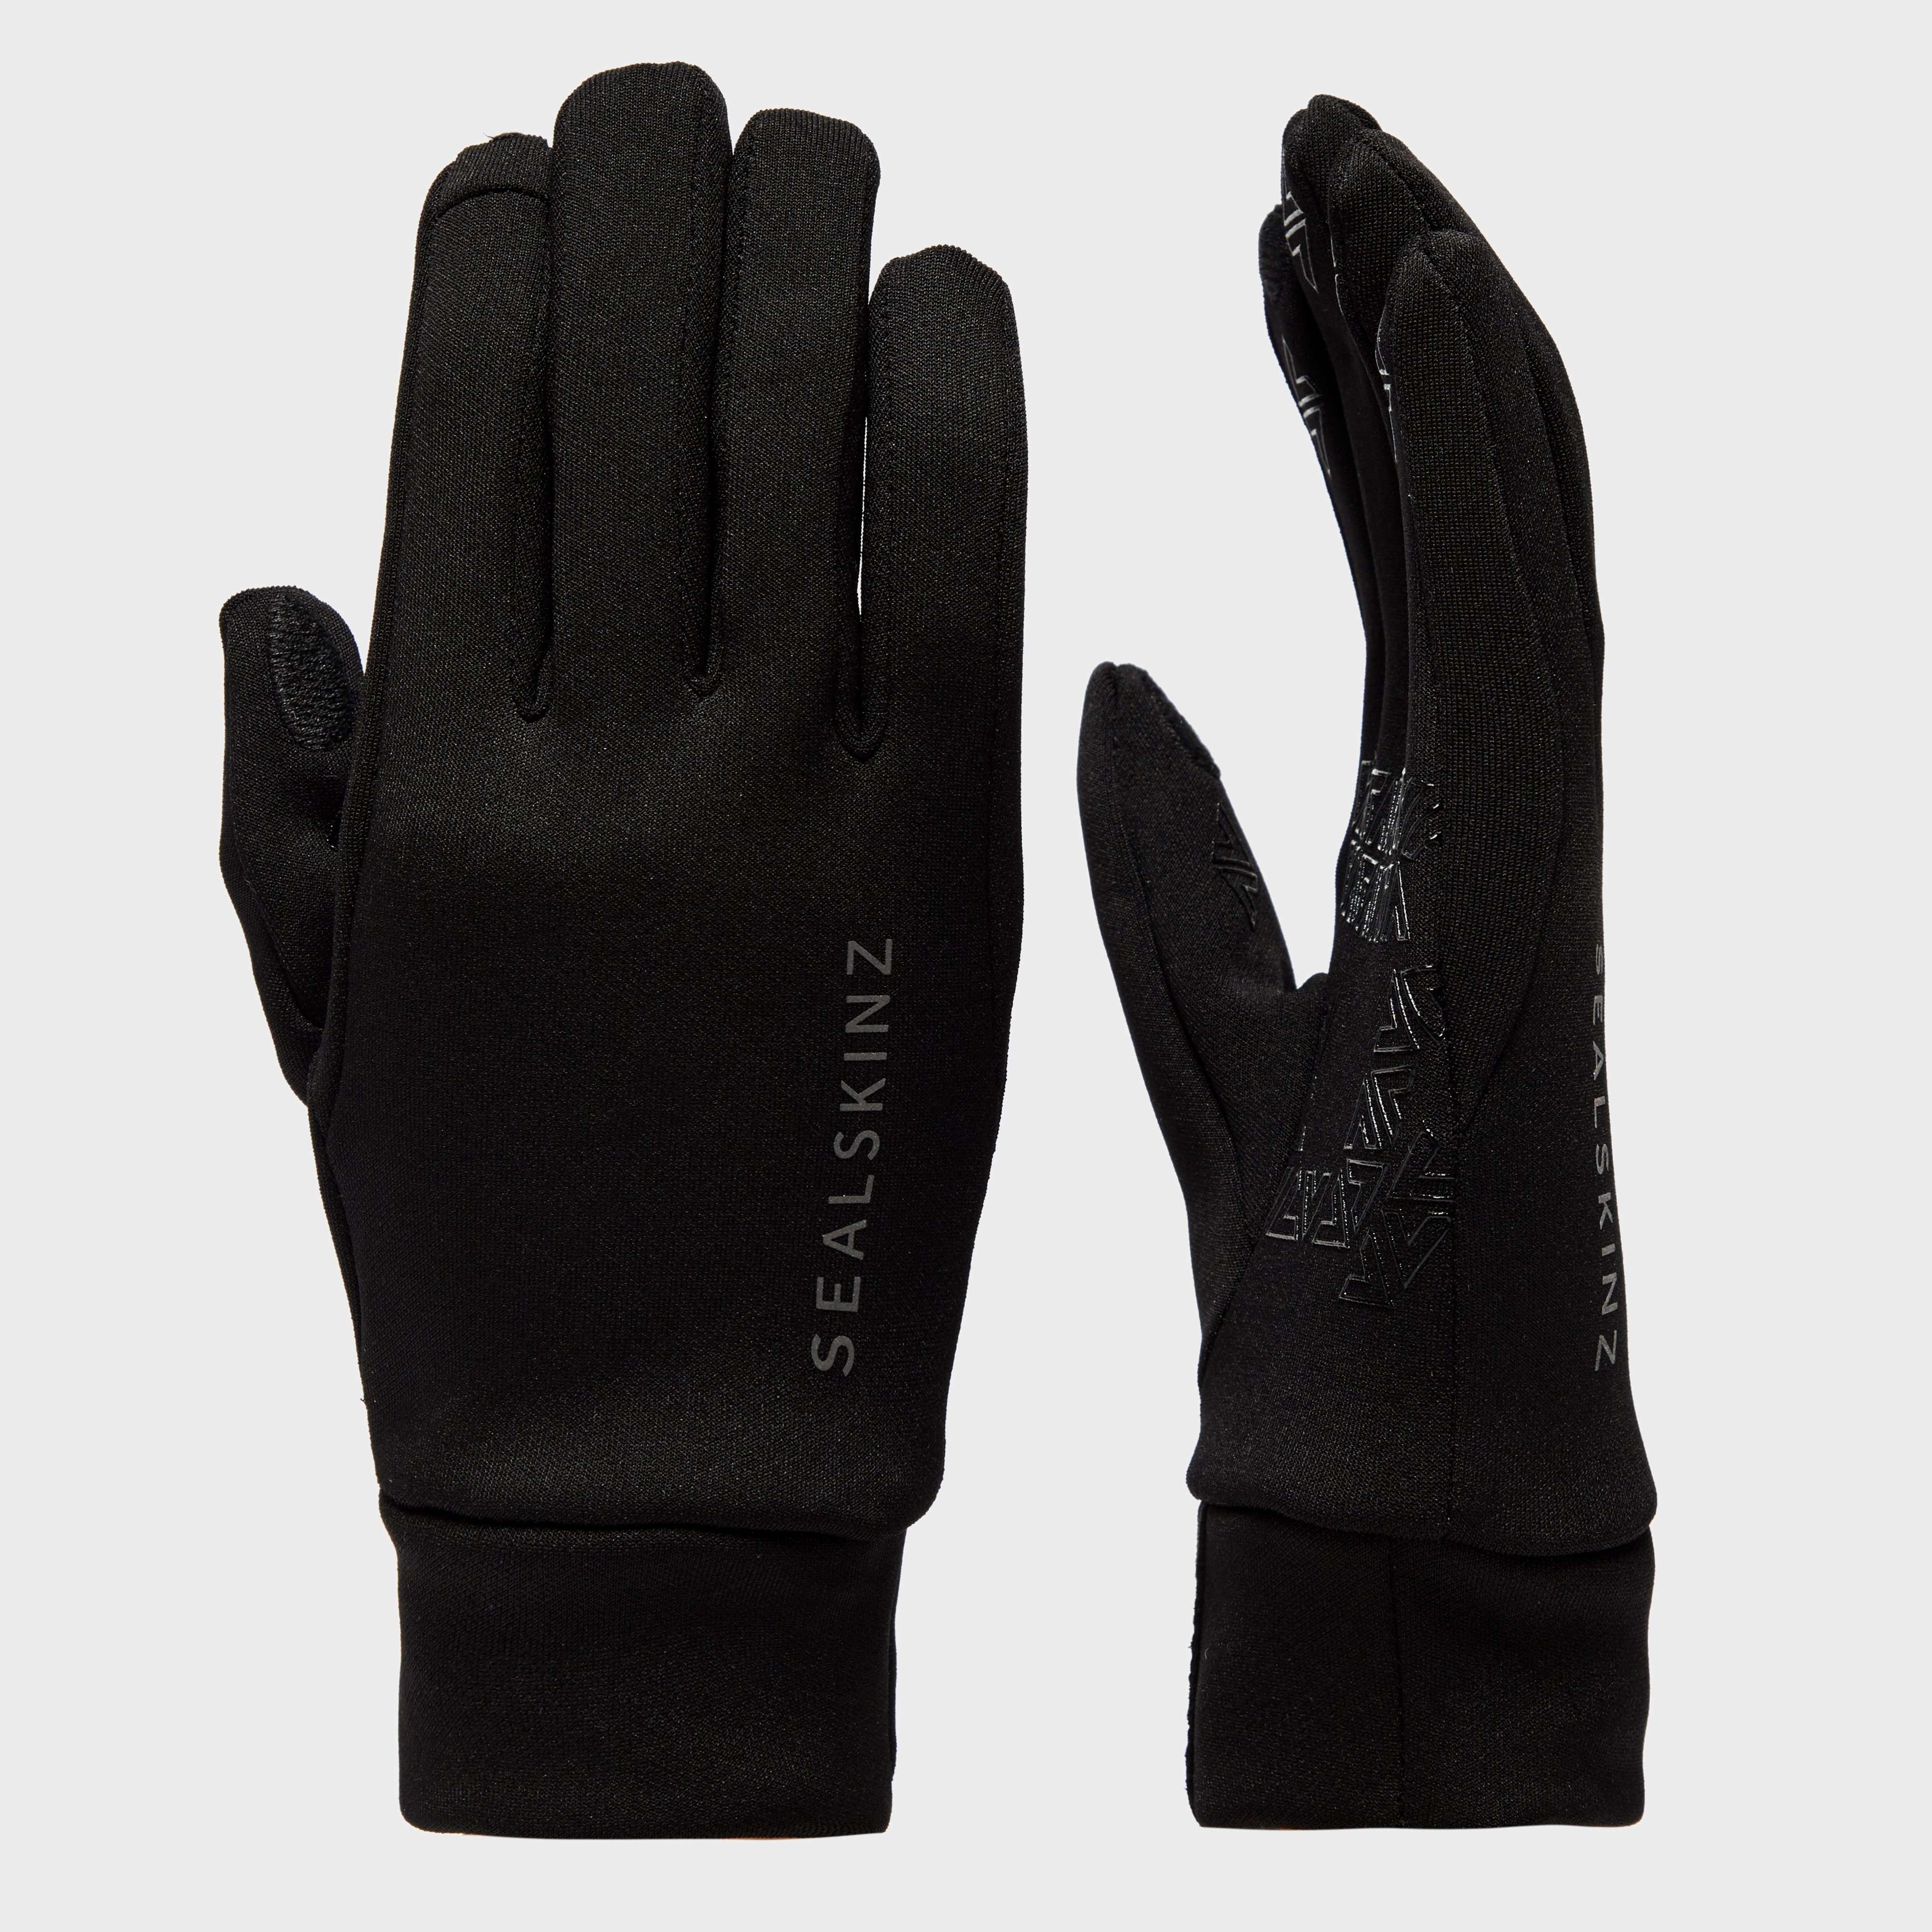 SEALSKINZ Women's Fairfield Glove